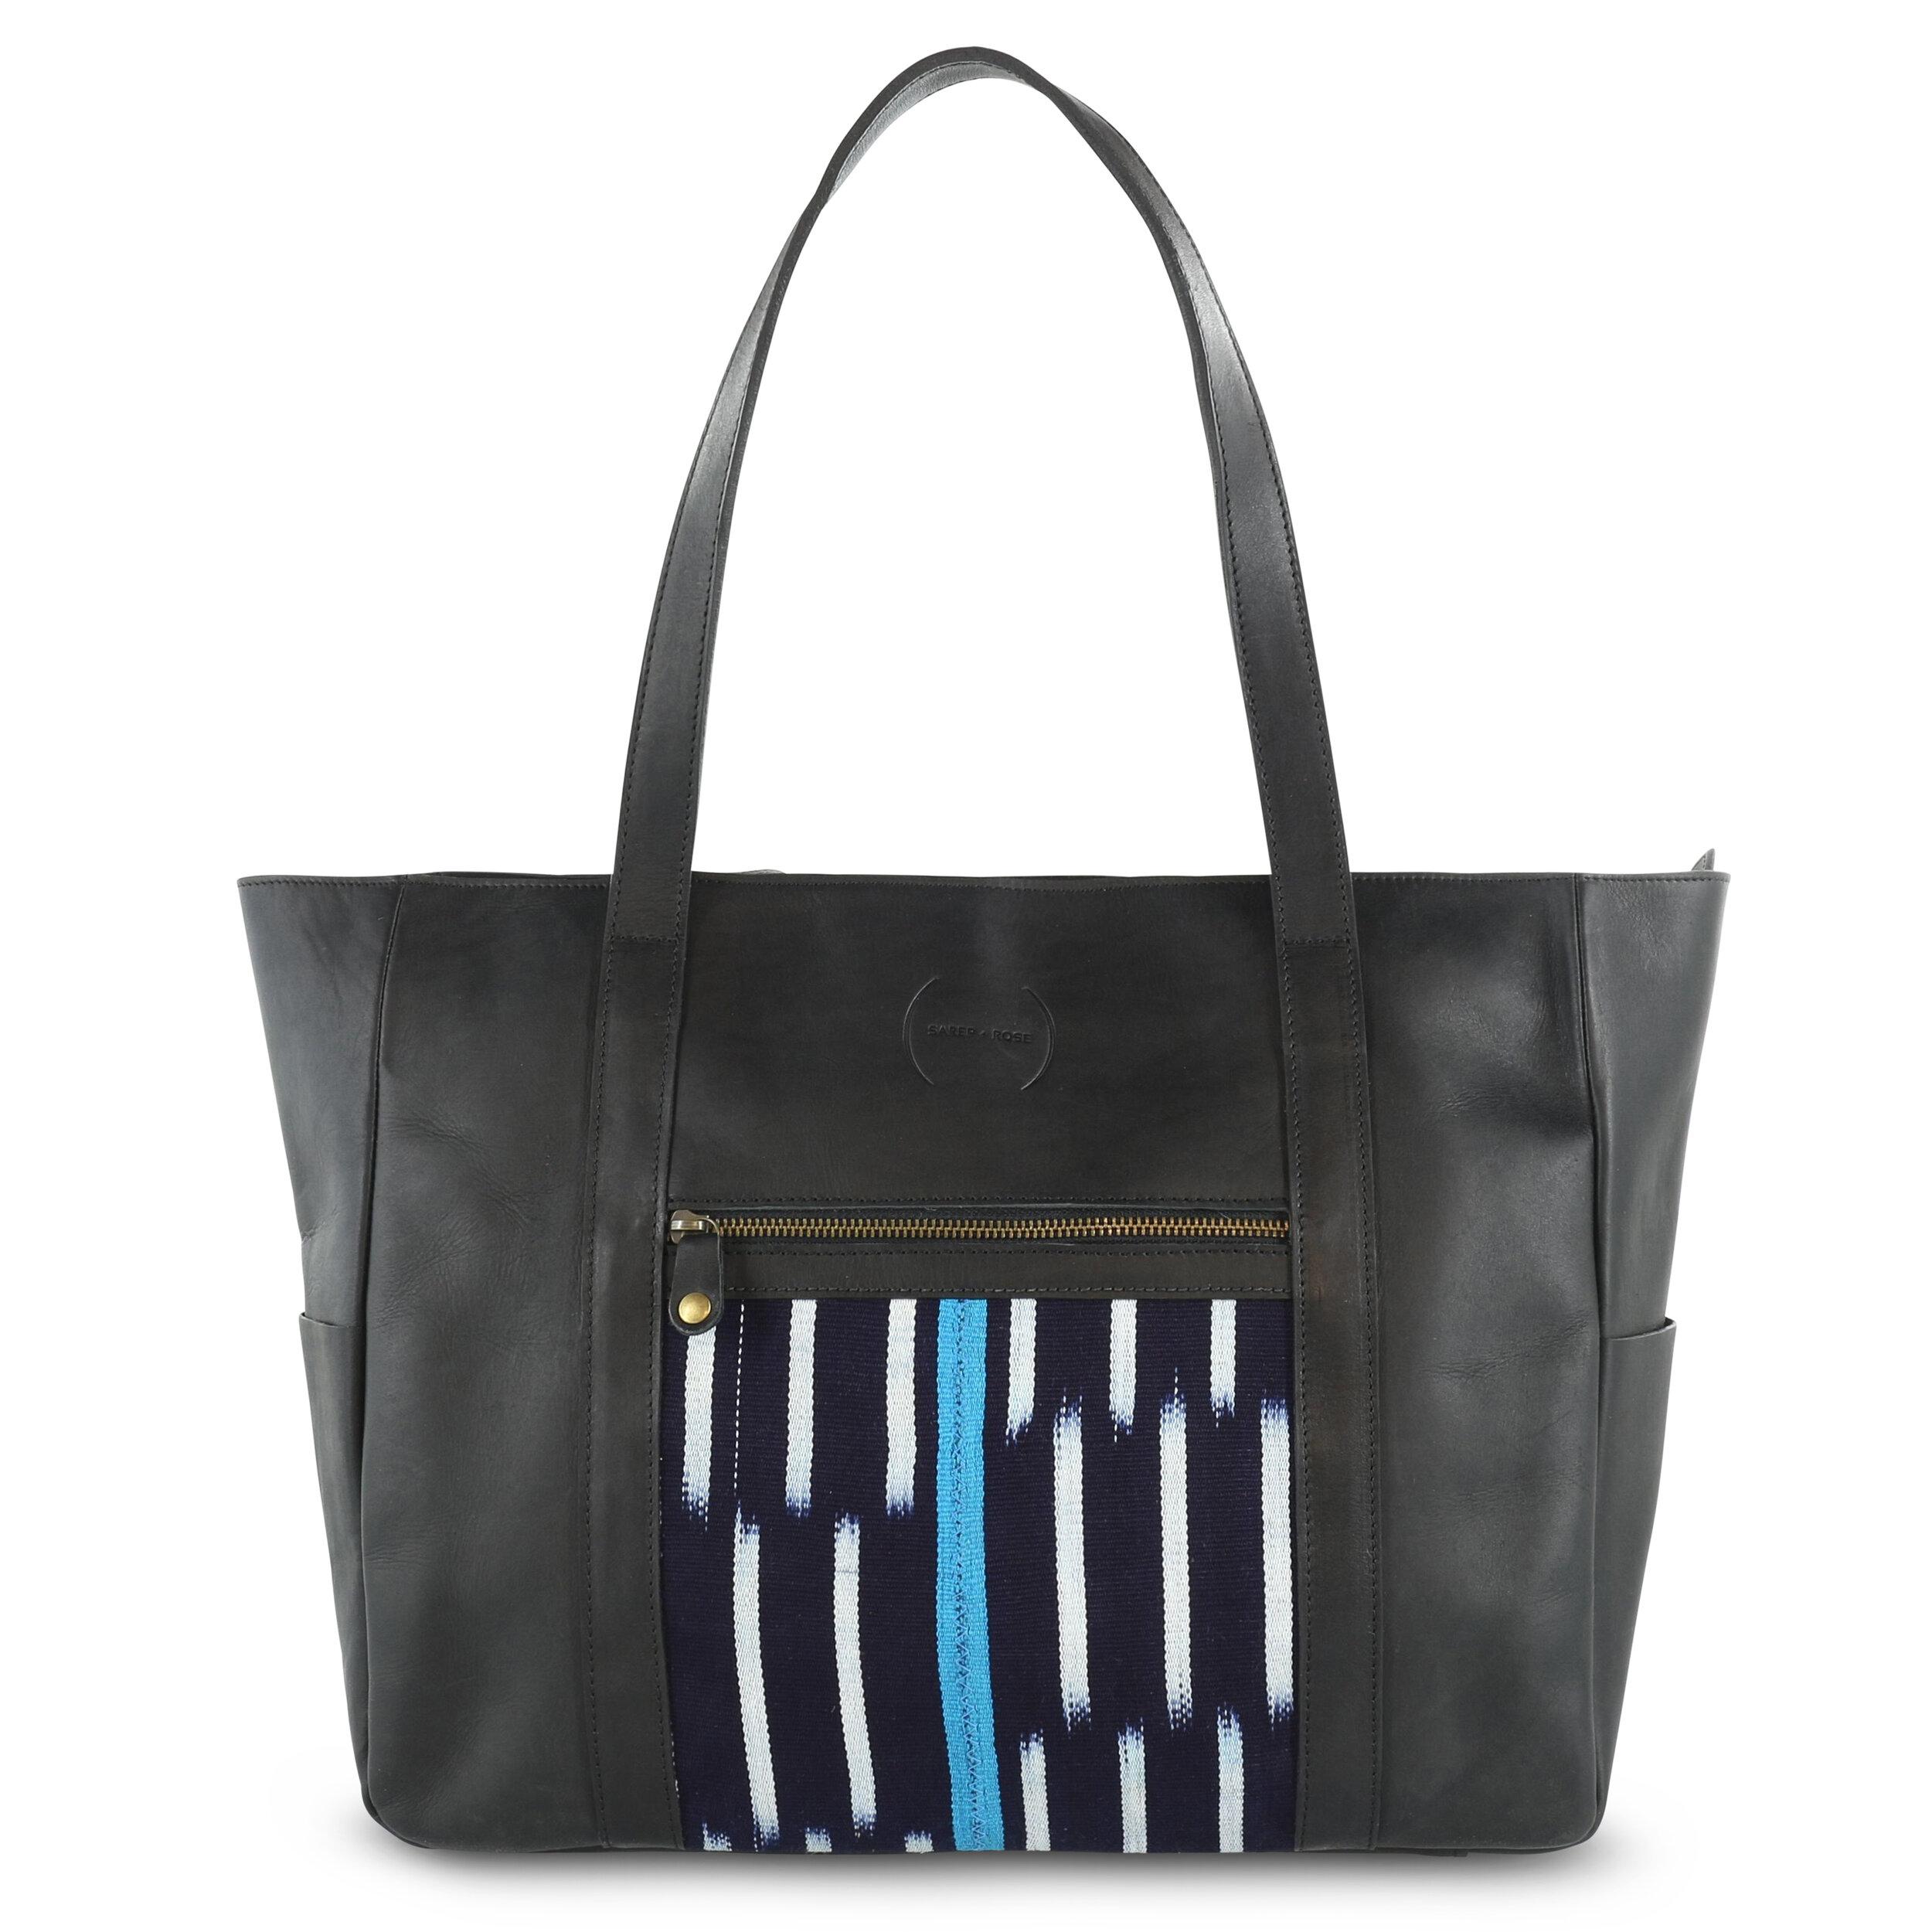 Cara bag_Black w blue tone baoule_front.jpg